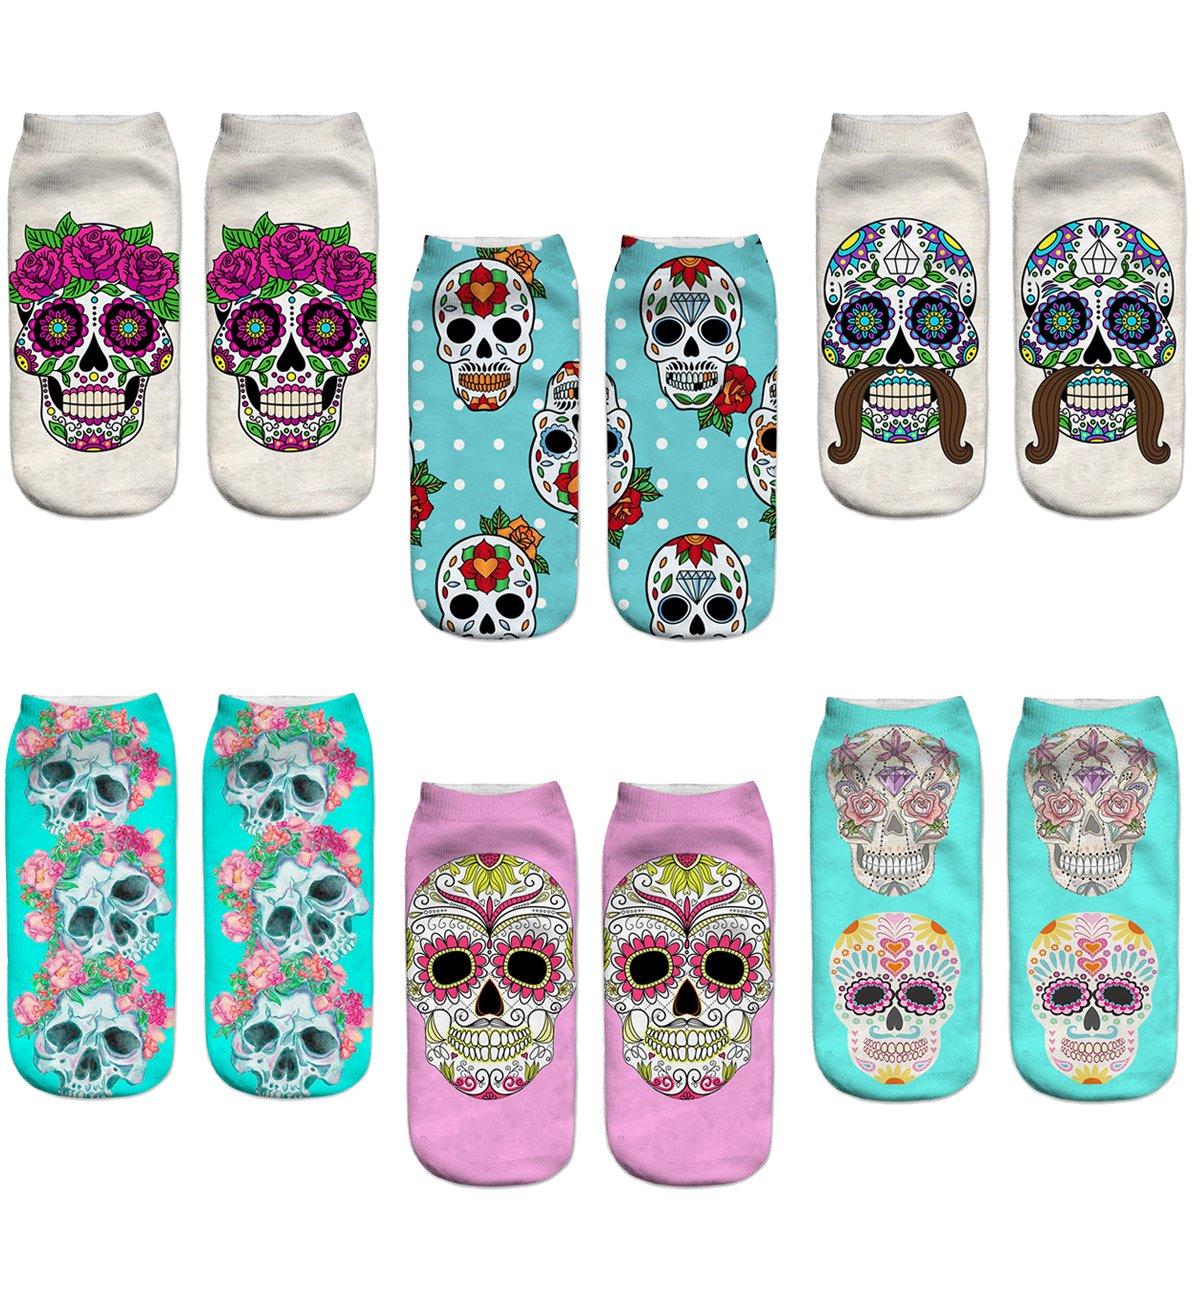 Women's 3D Cartoon Print Funny Smiley Casual Crazy Novelty Ankle Socks Value Pack (skull 1)